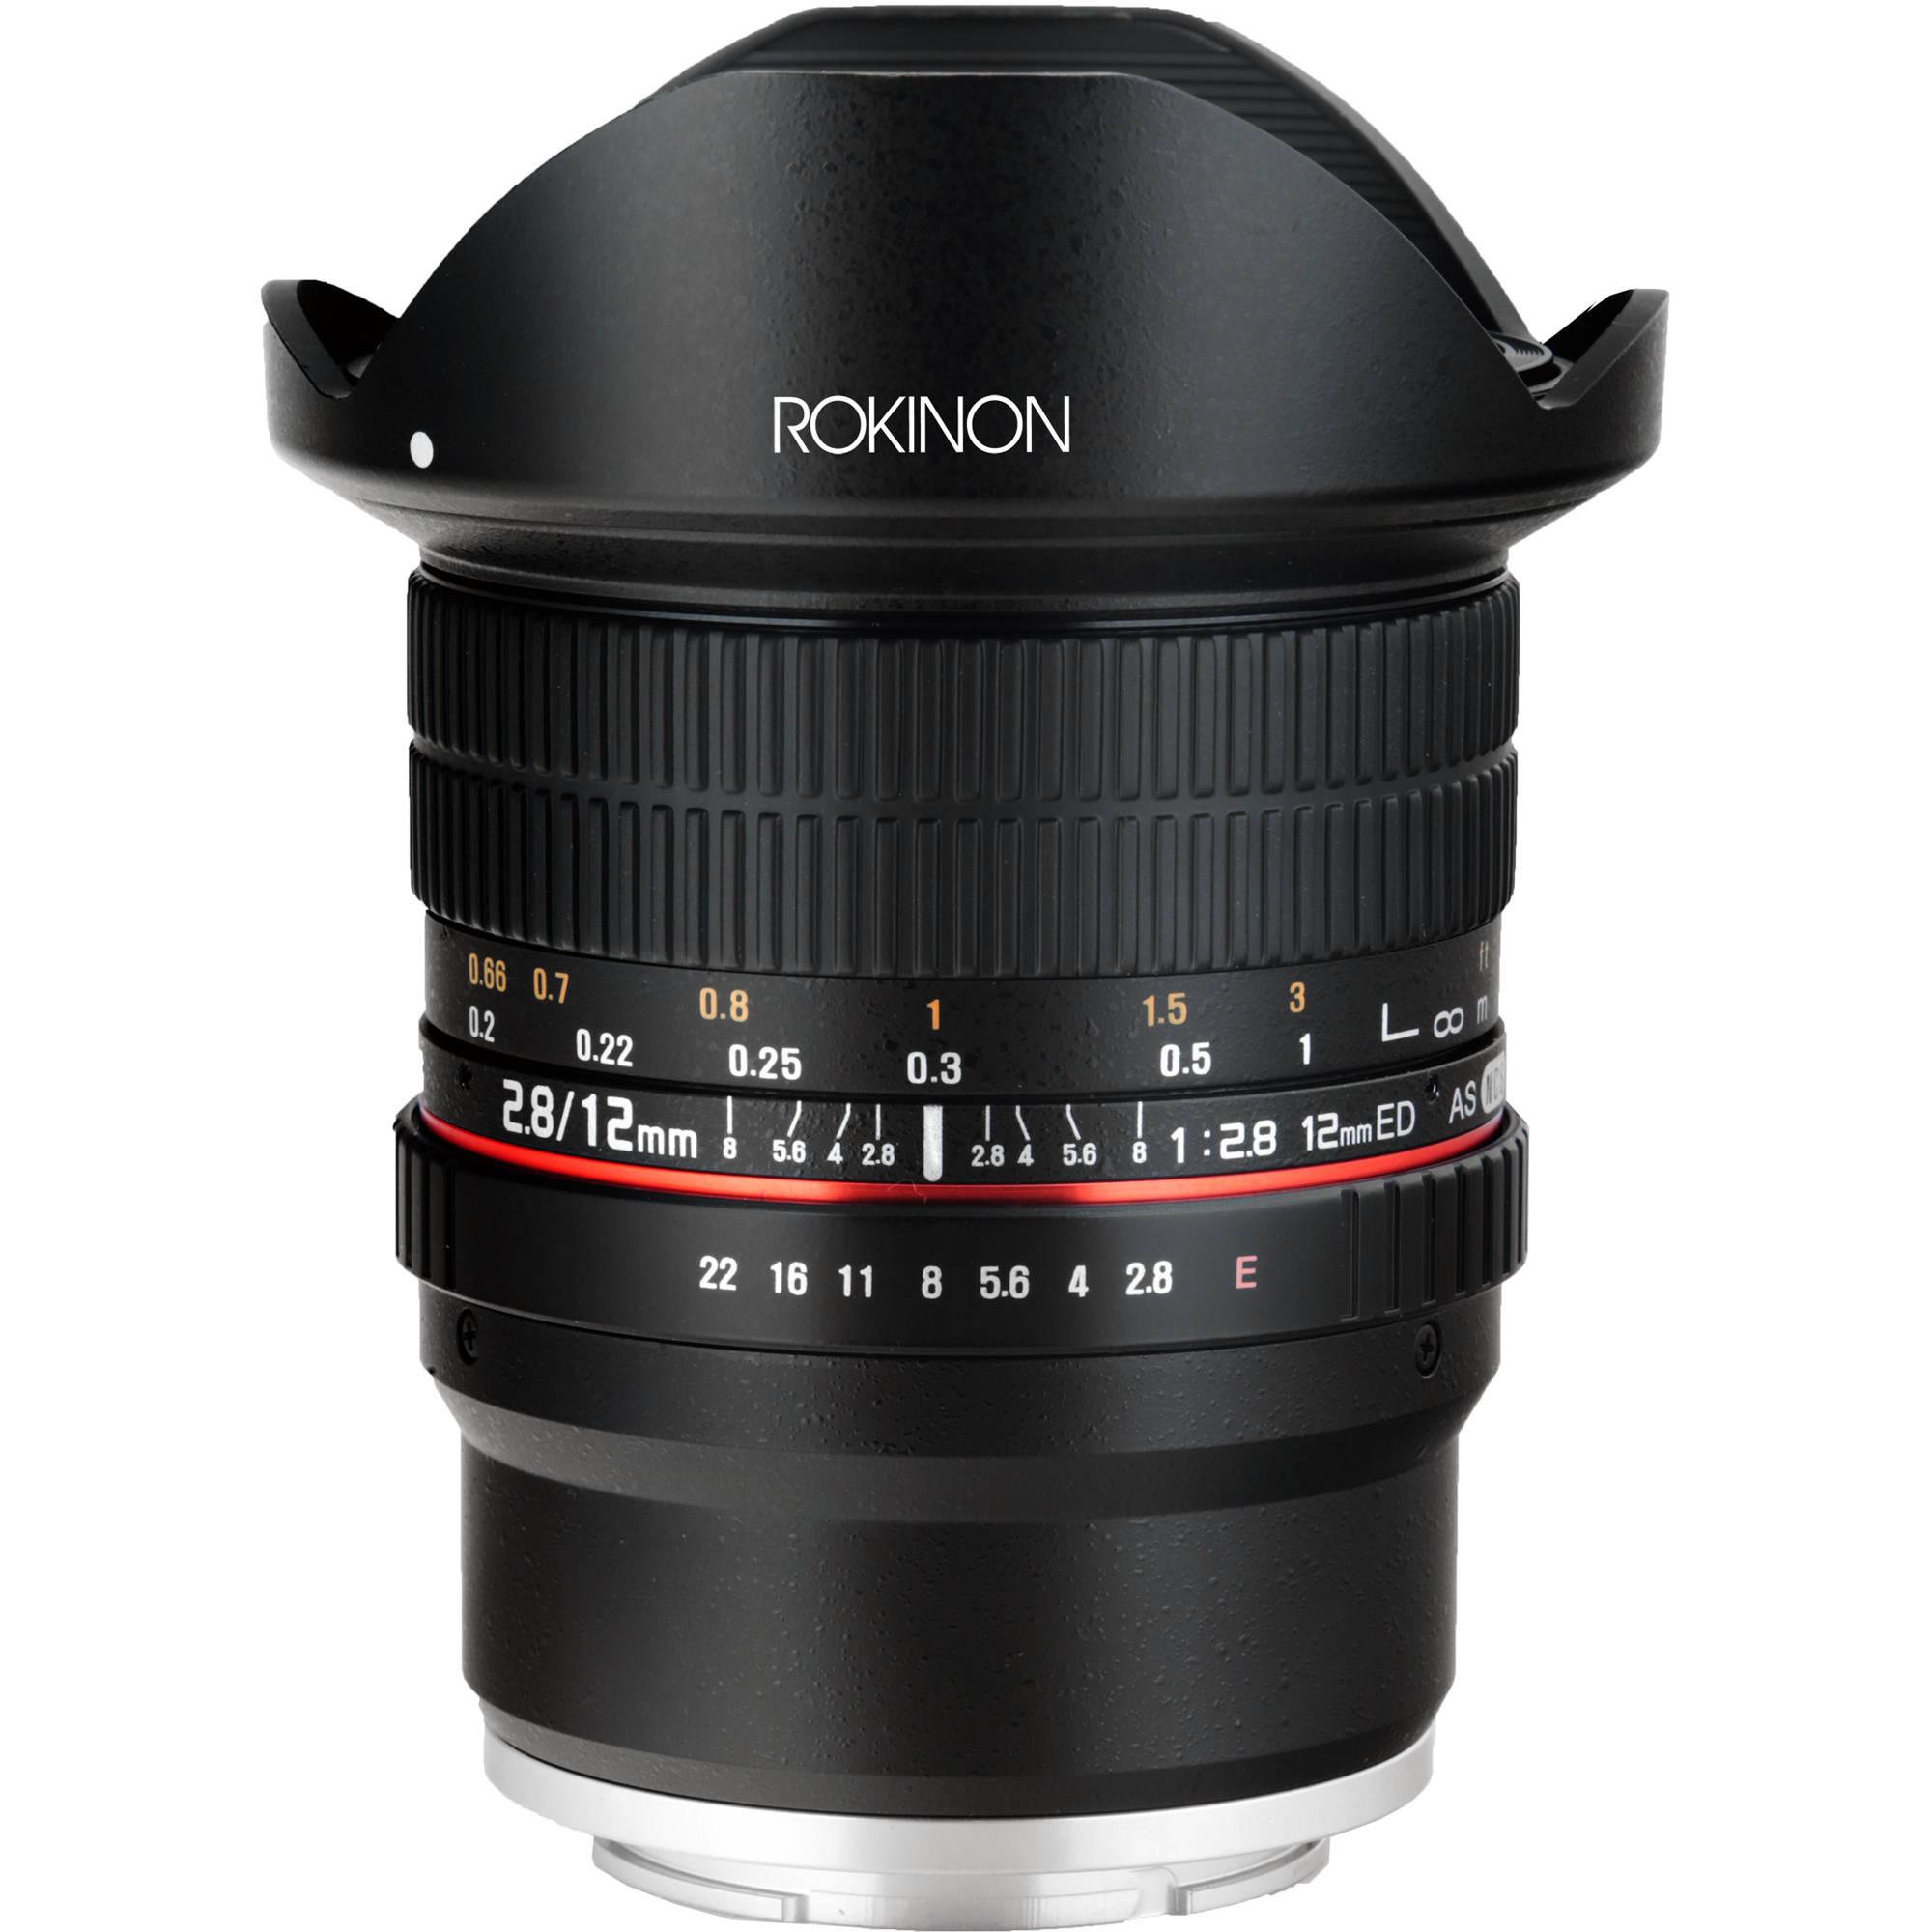 Rokinon 12mm F 2 8 Ed As If Ncs Umc Fisheye Lens For Sony E